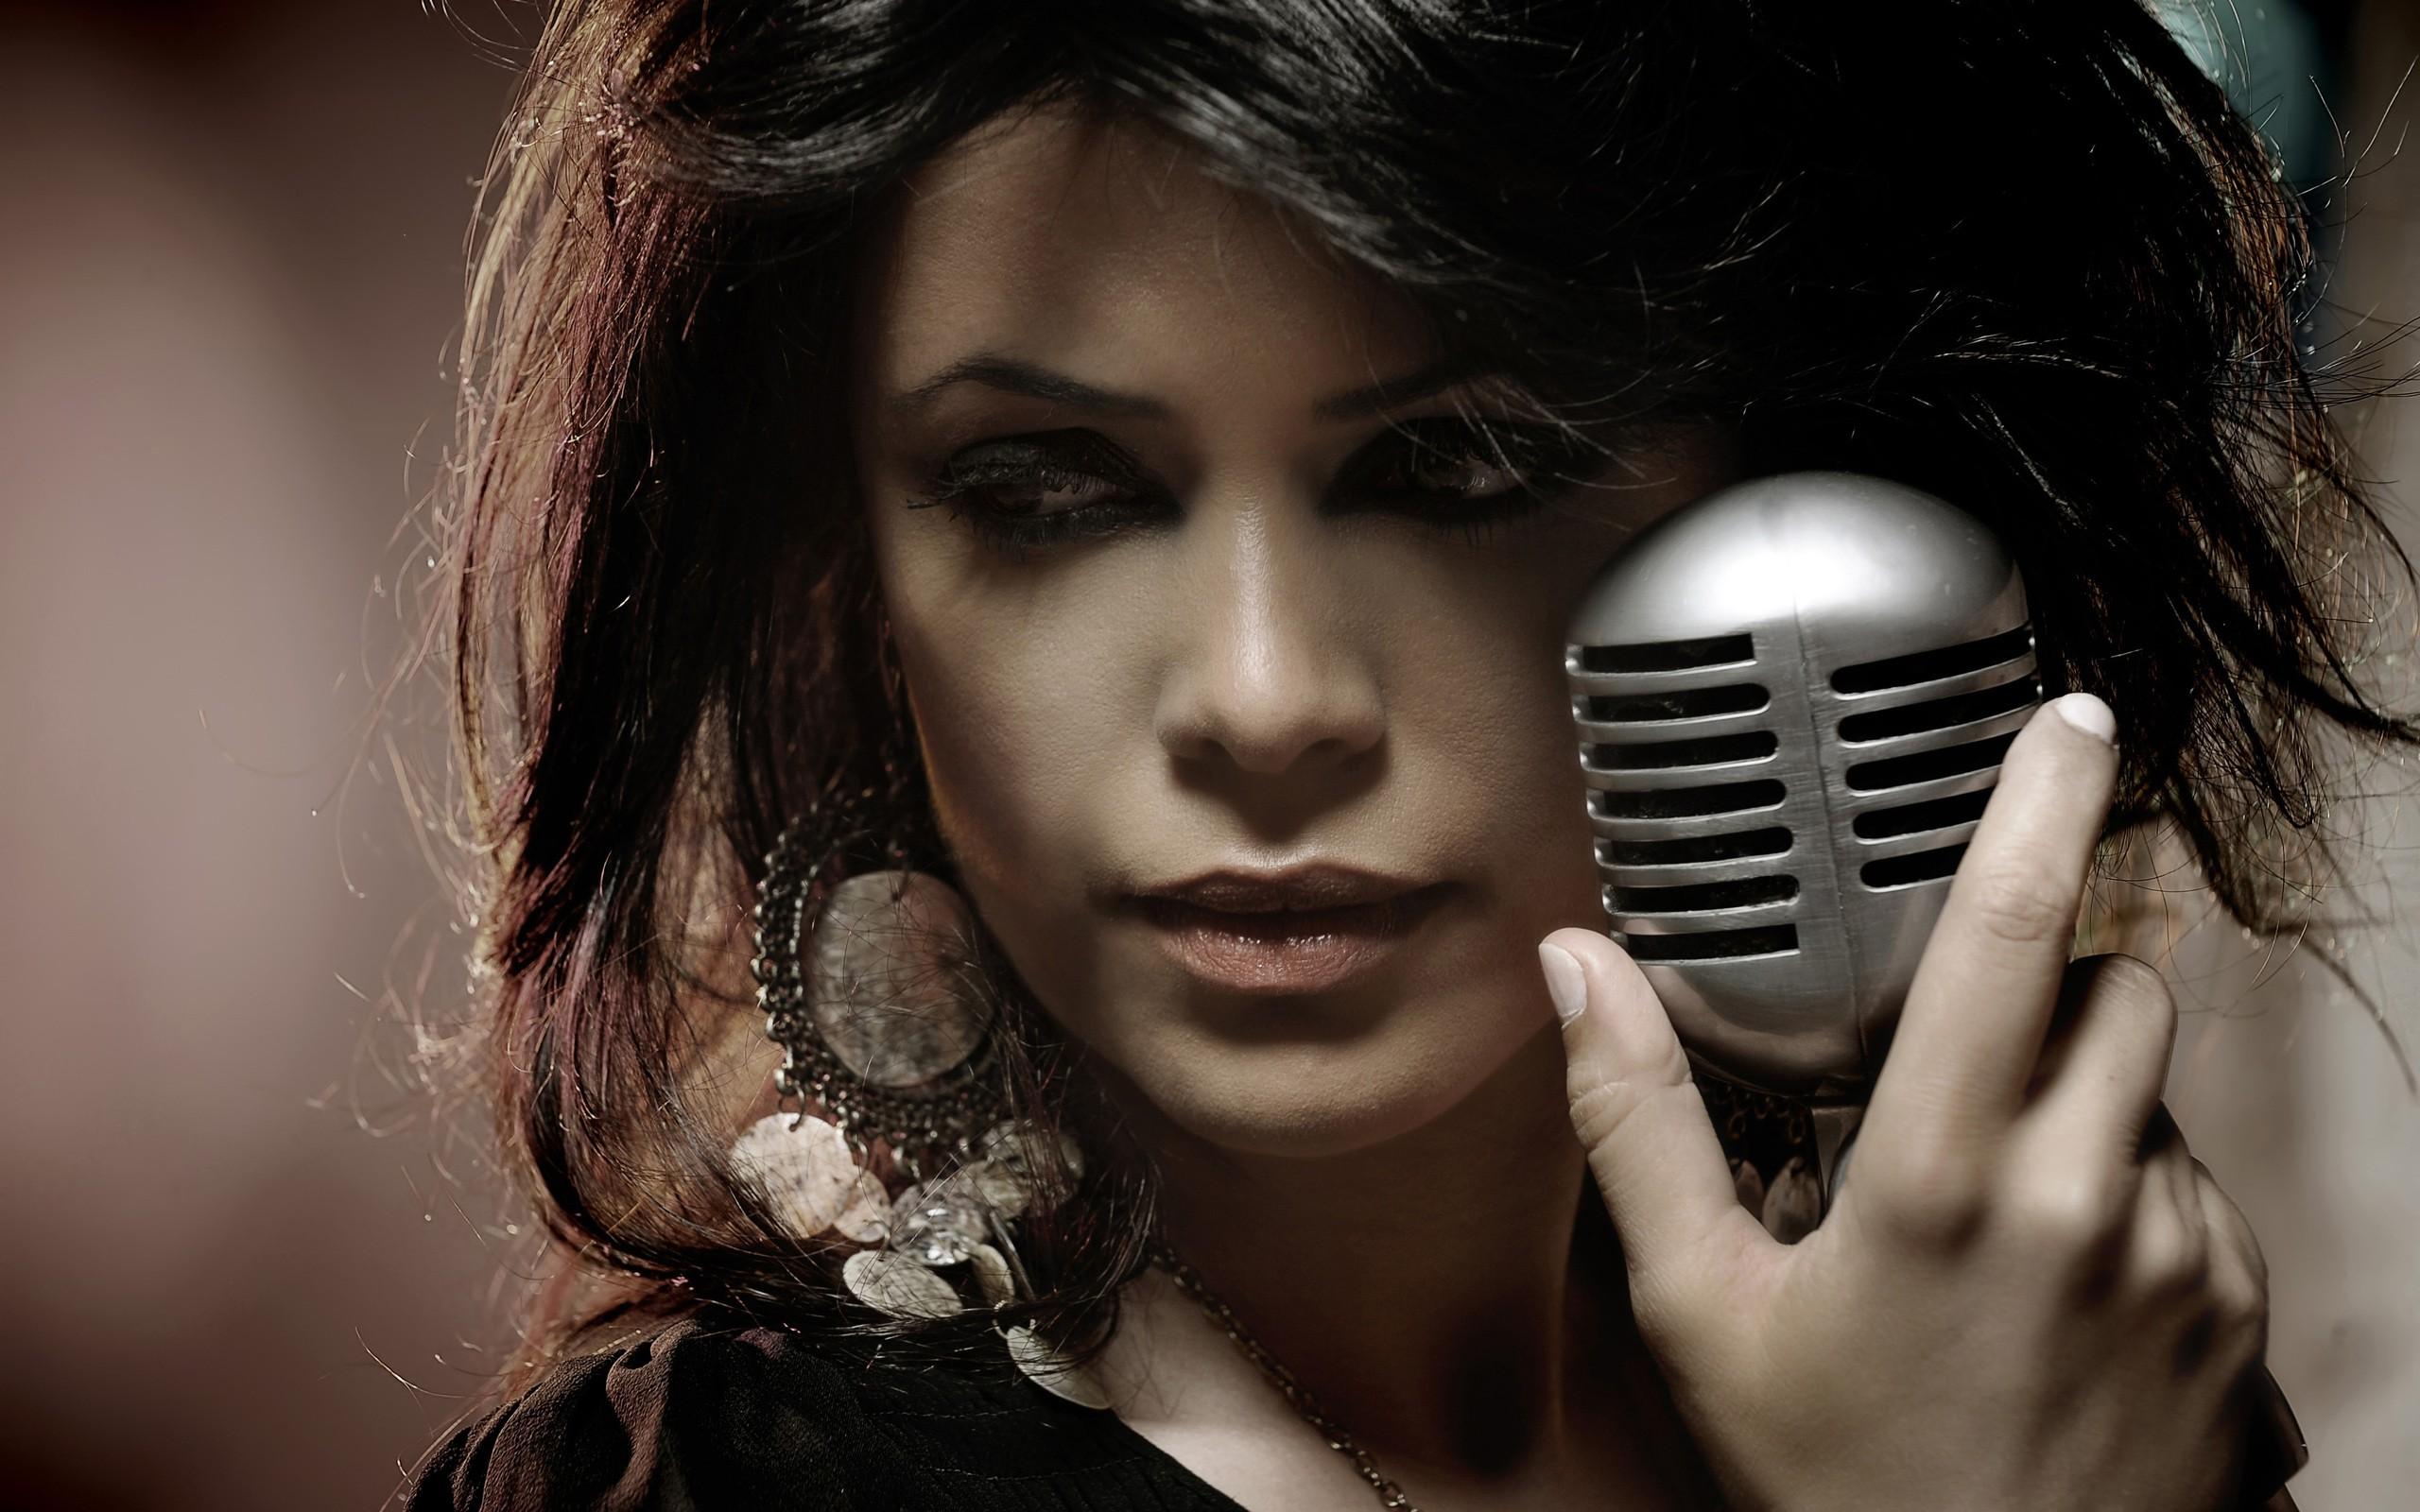 042548-microphone-music-women